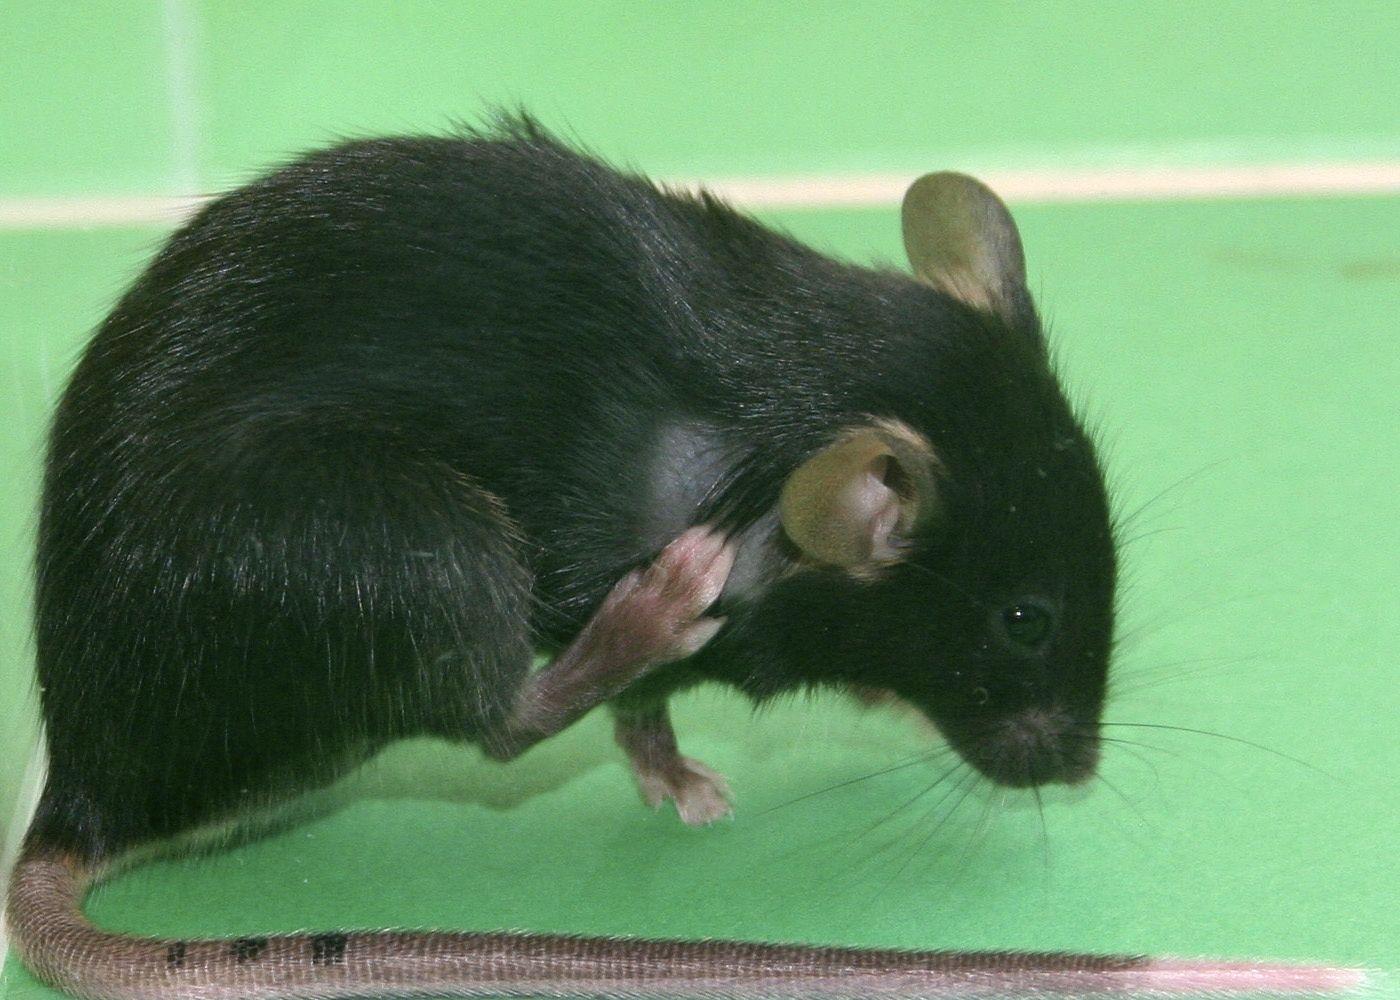 Maus / Mäuse